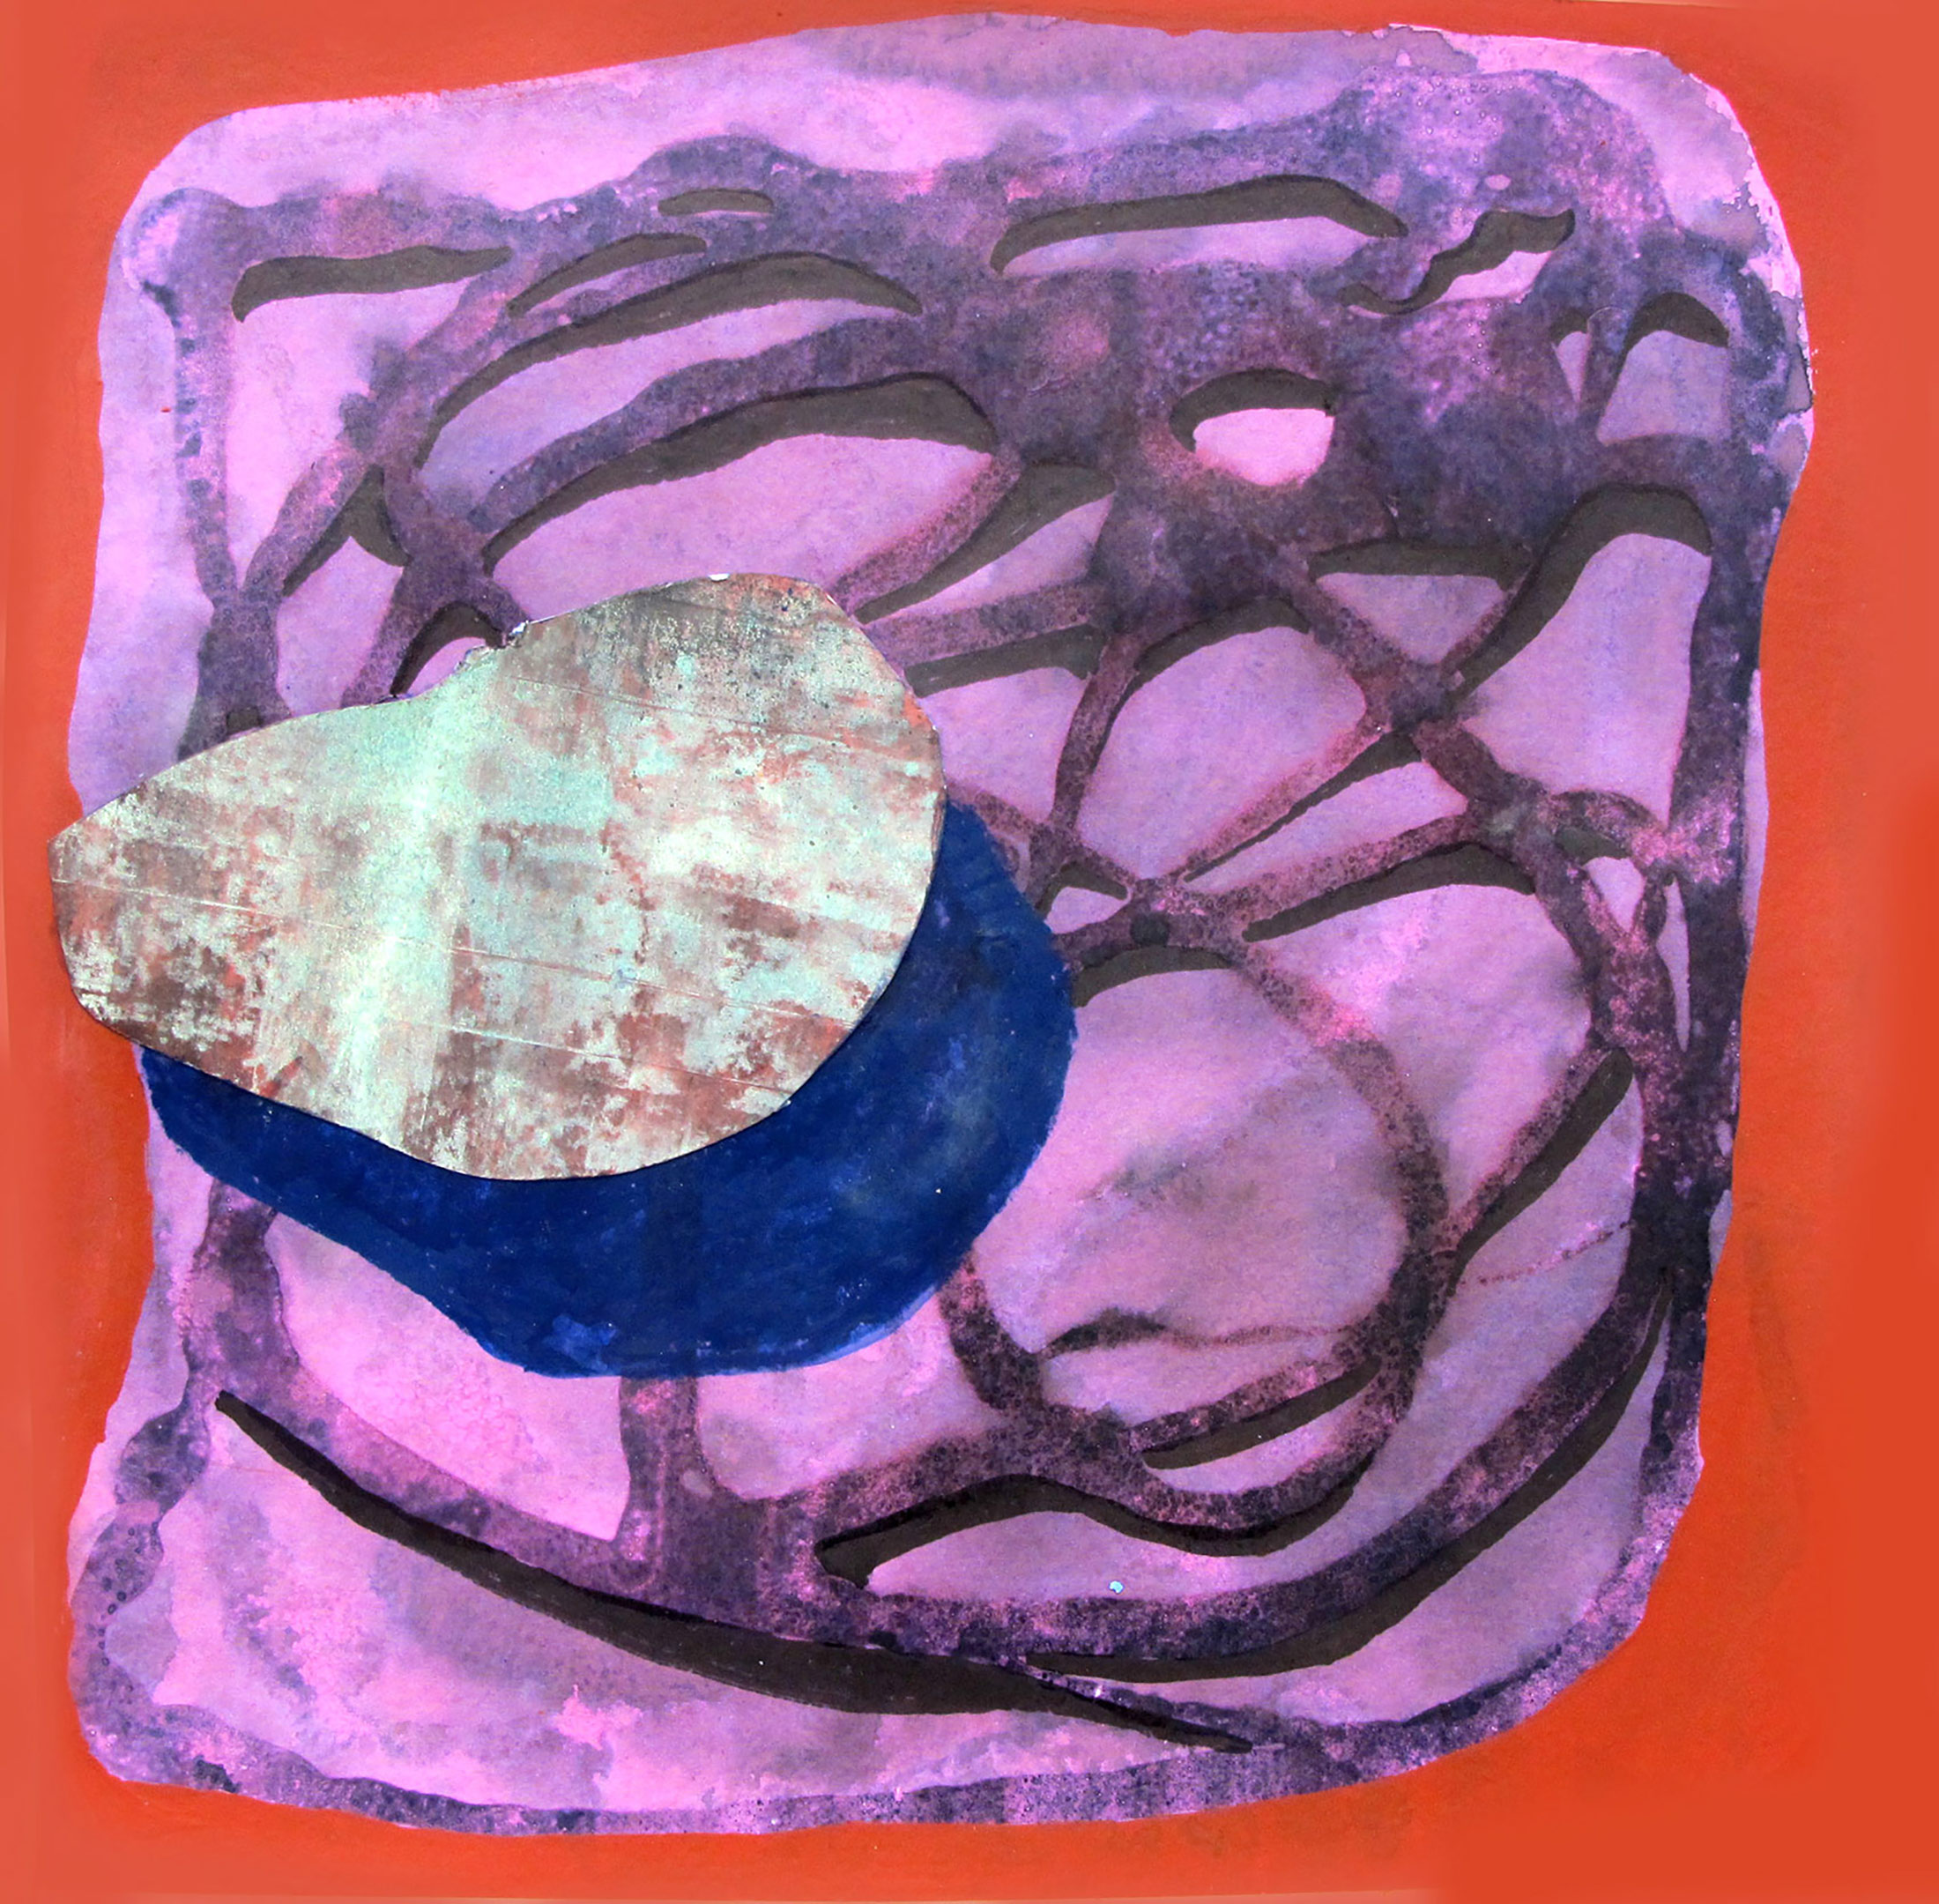 alexandra feusi, female contemporary artist, oil pastel, color, works on paper, original piece